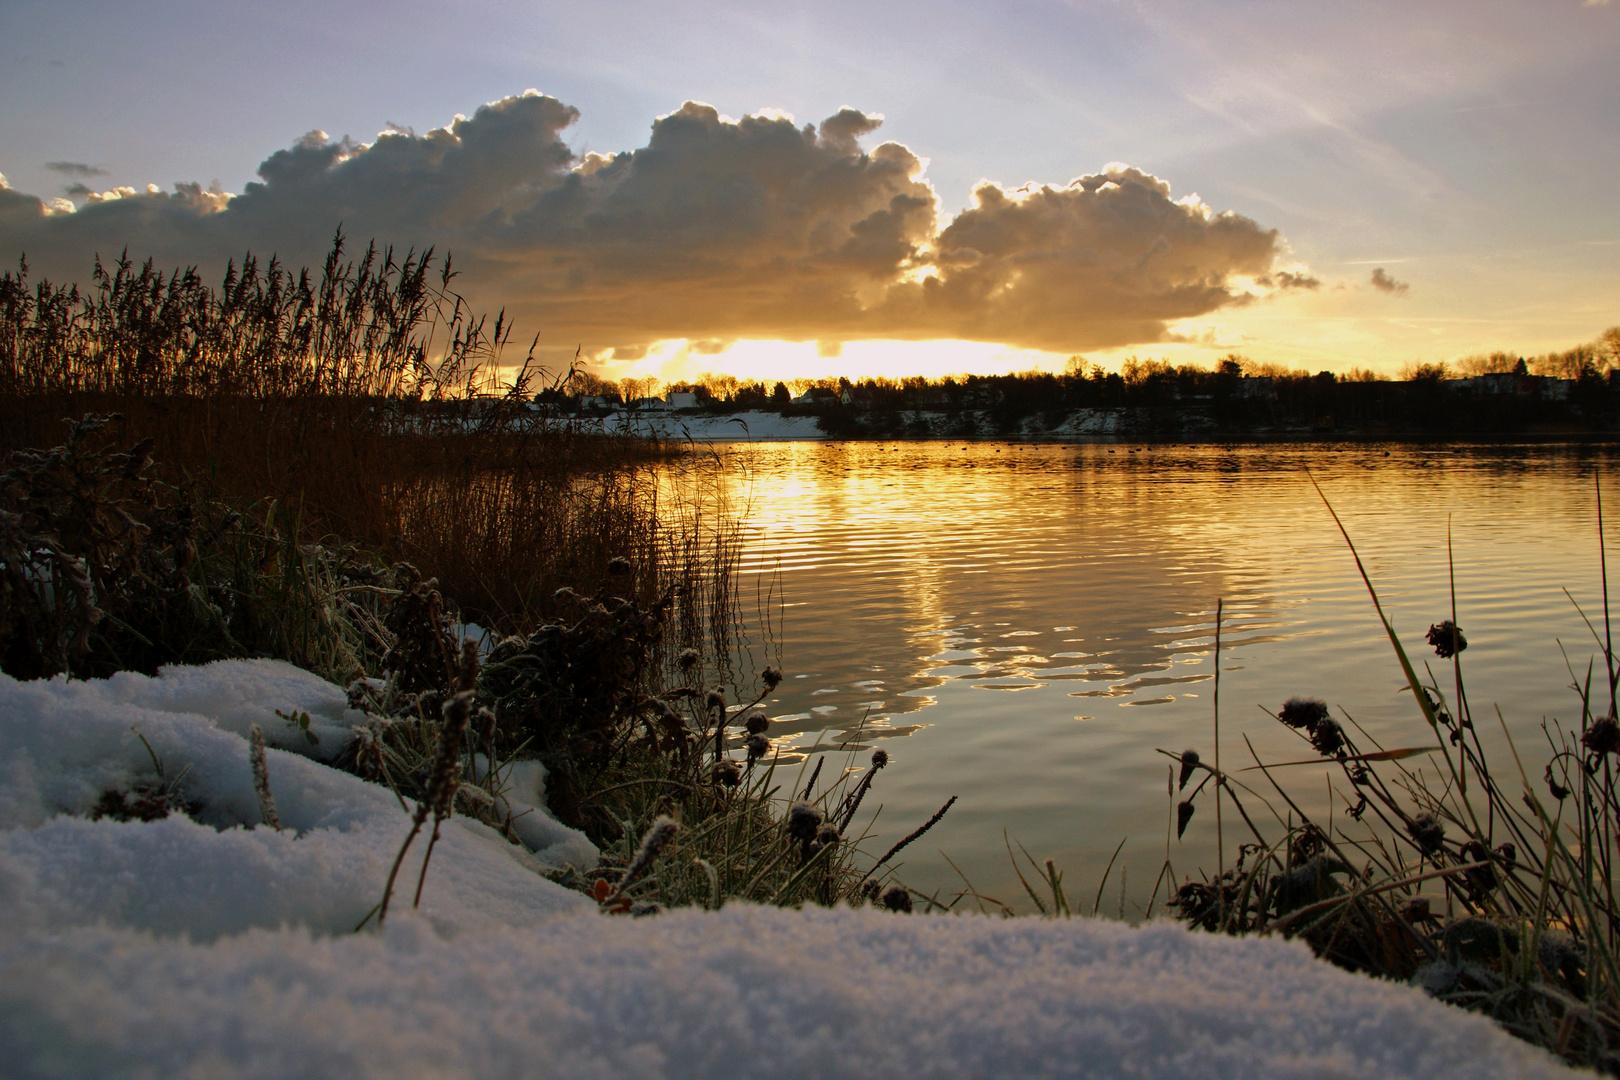 Nordholzer Baggersee